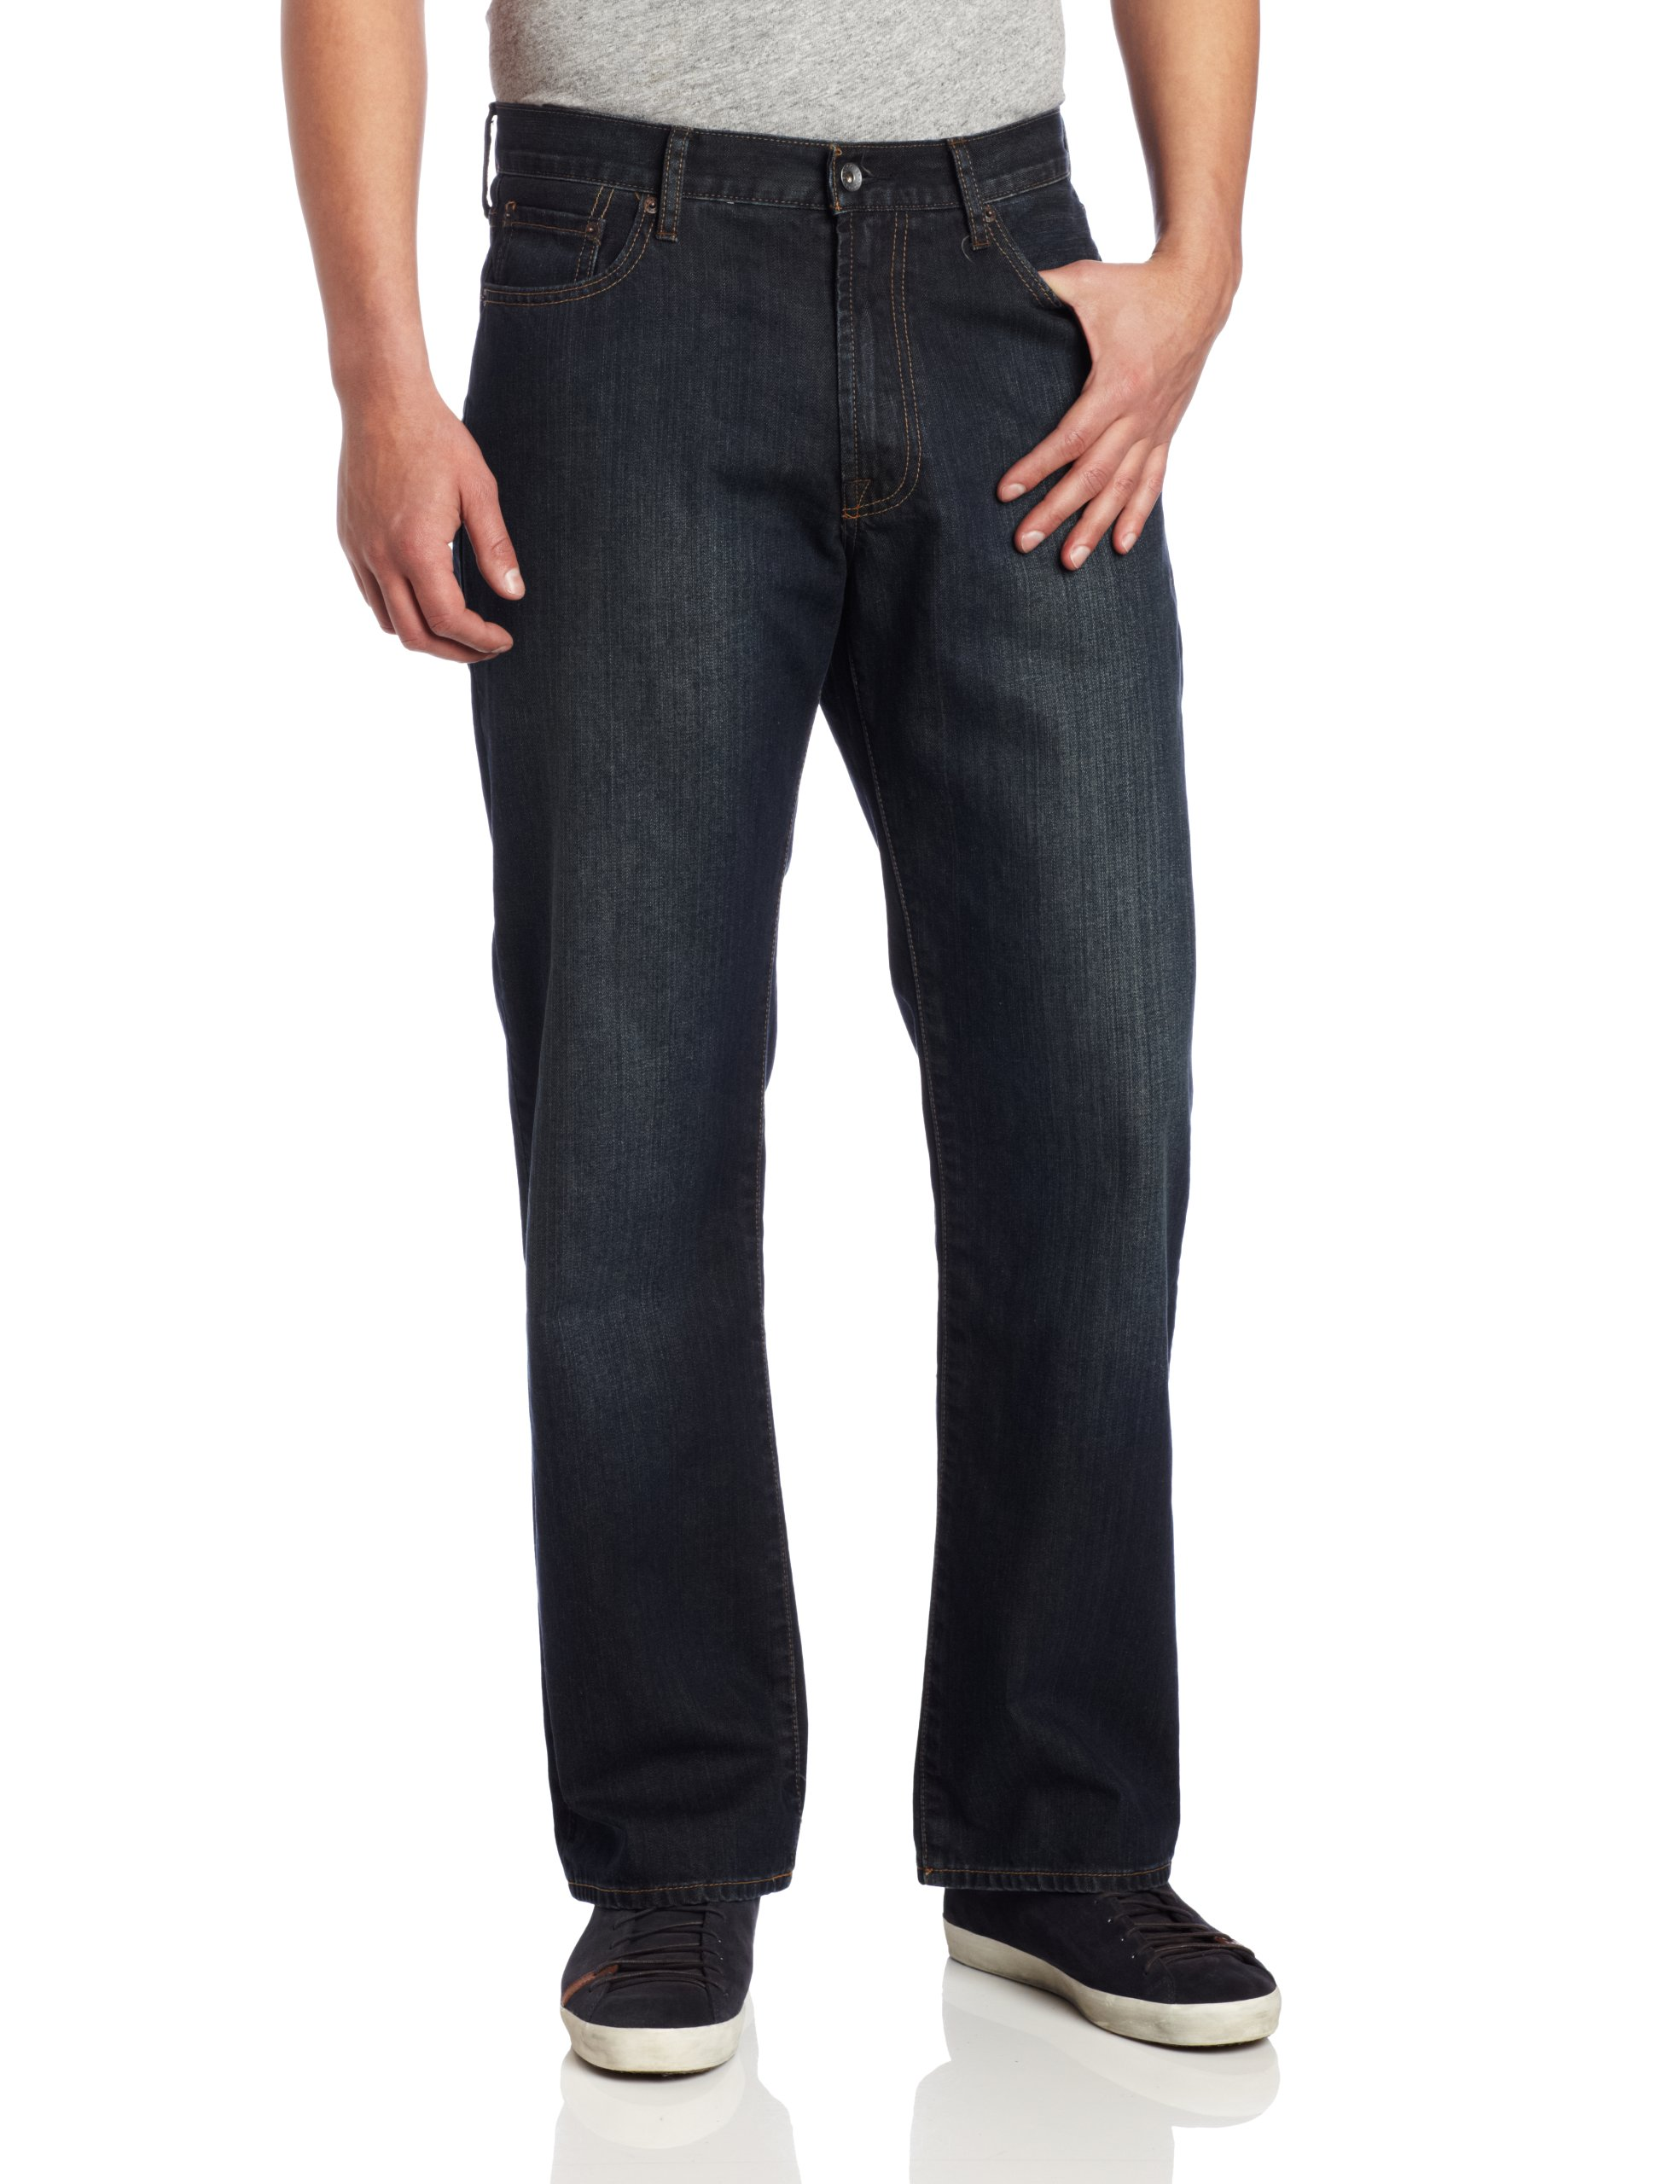 Lucky Brand Men's 181 Relaxed Straight Leg Jean In Love Train, Lovetrain, 38W x 34L